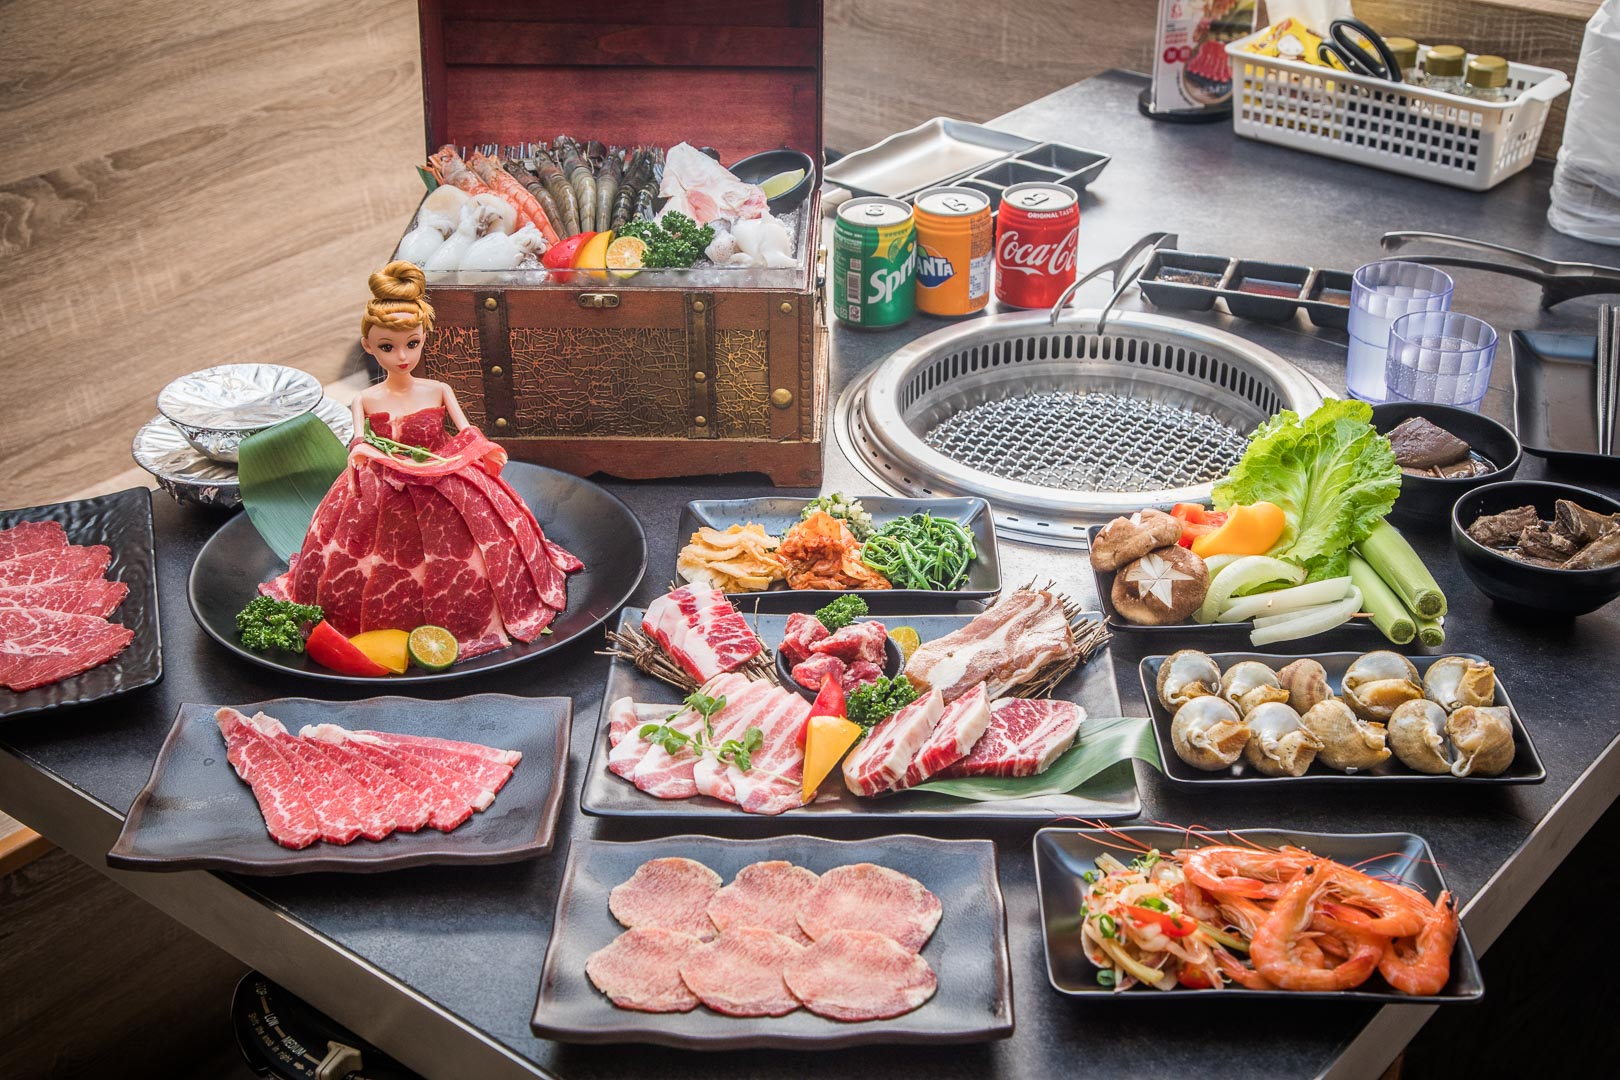 超夯の燒肉 中華店